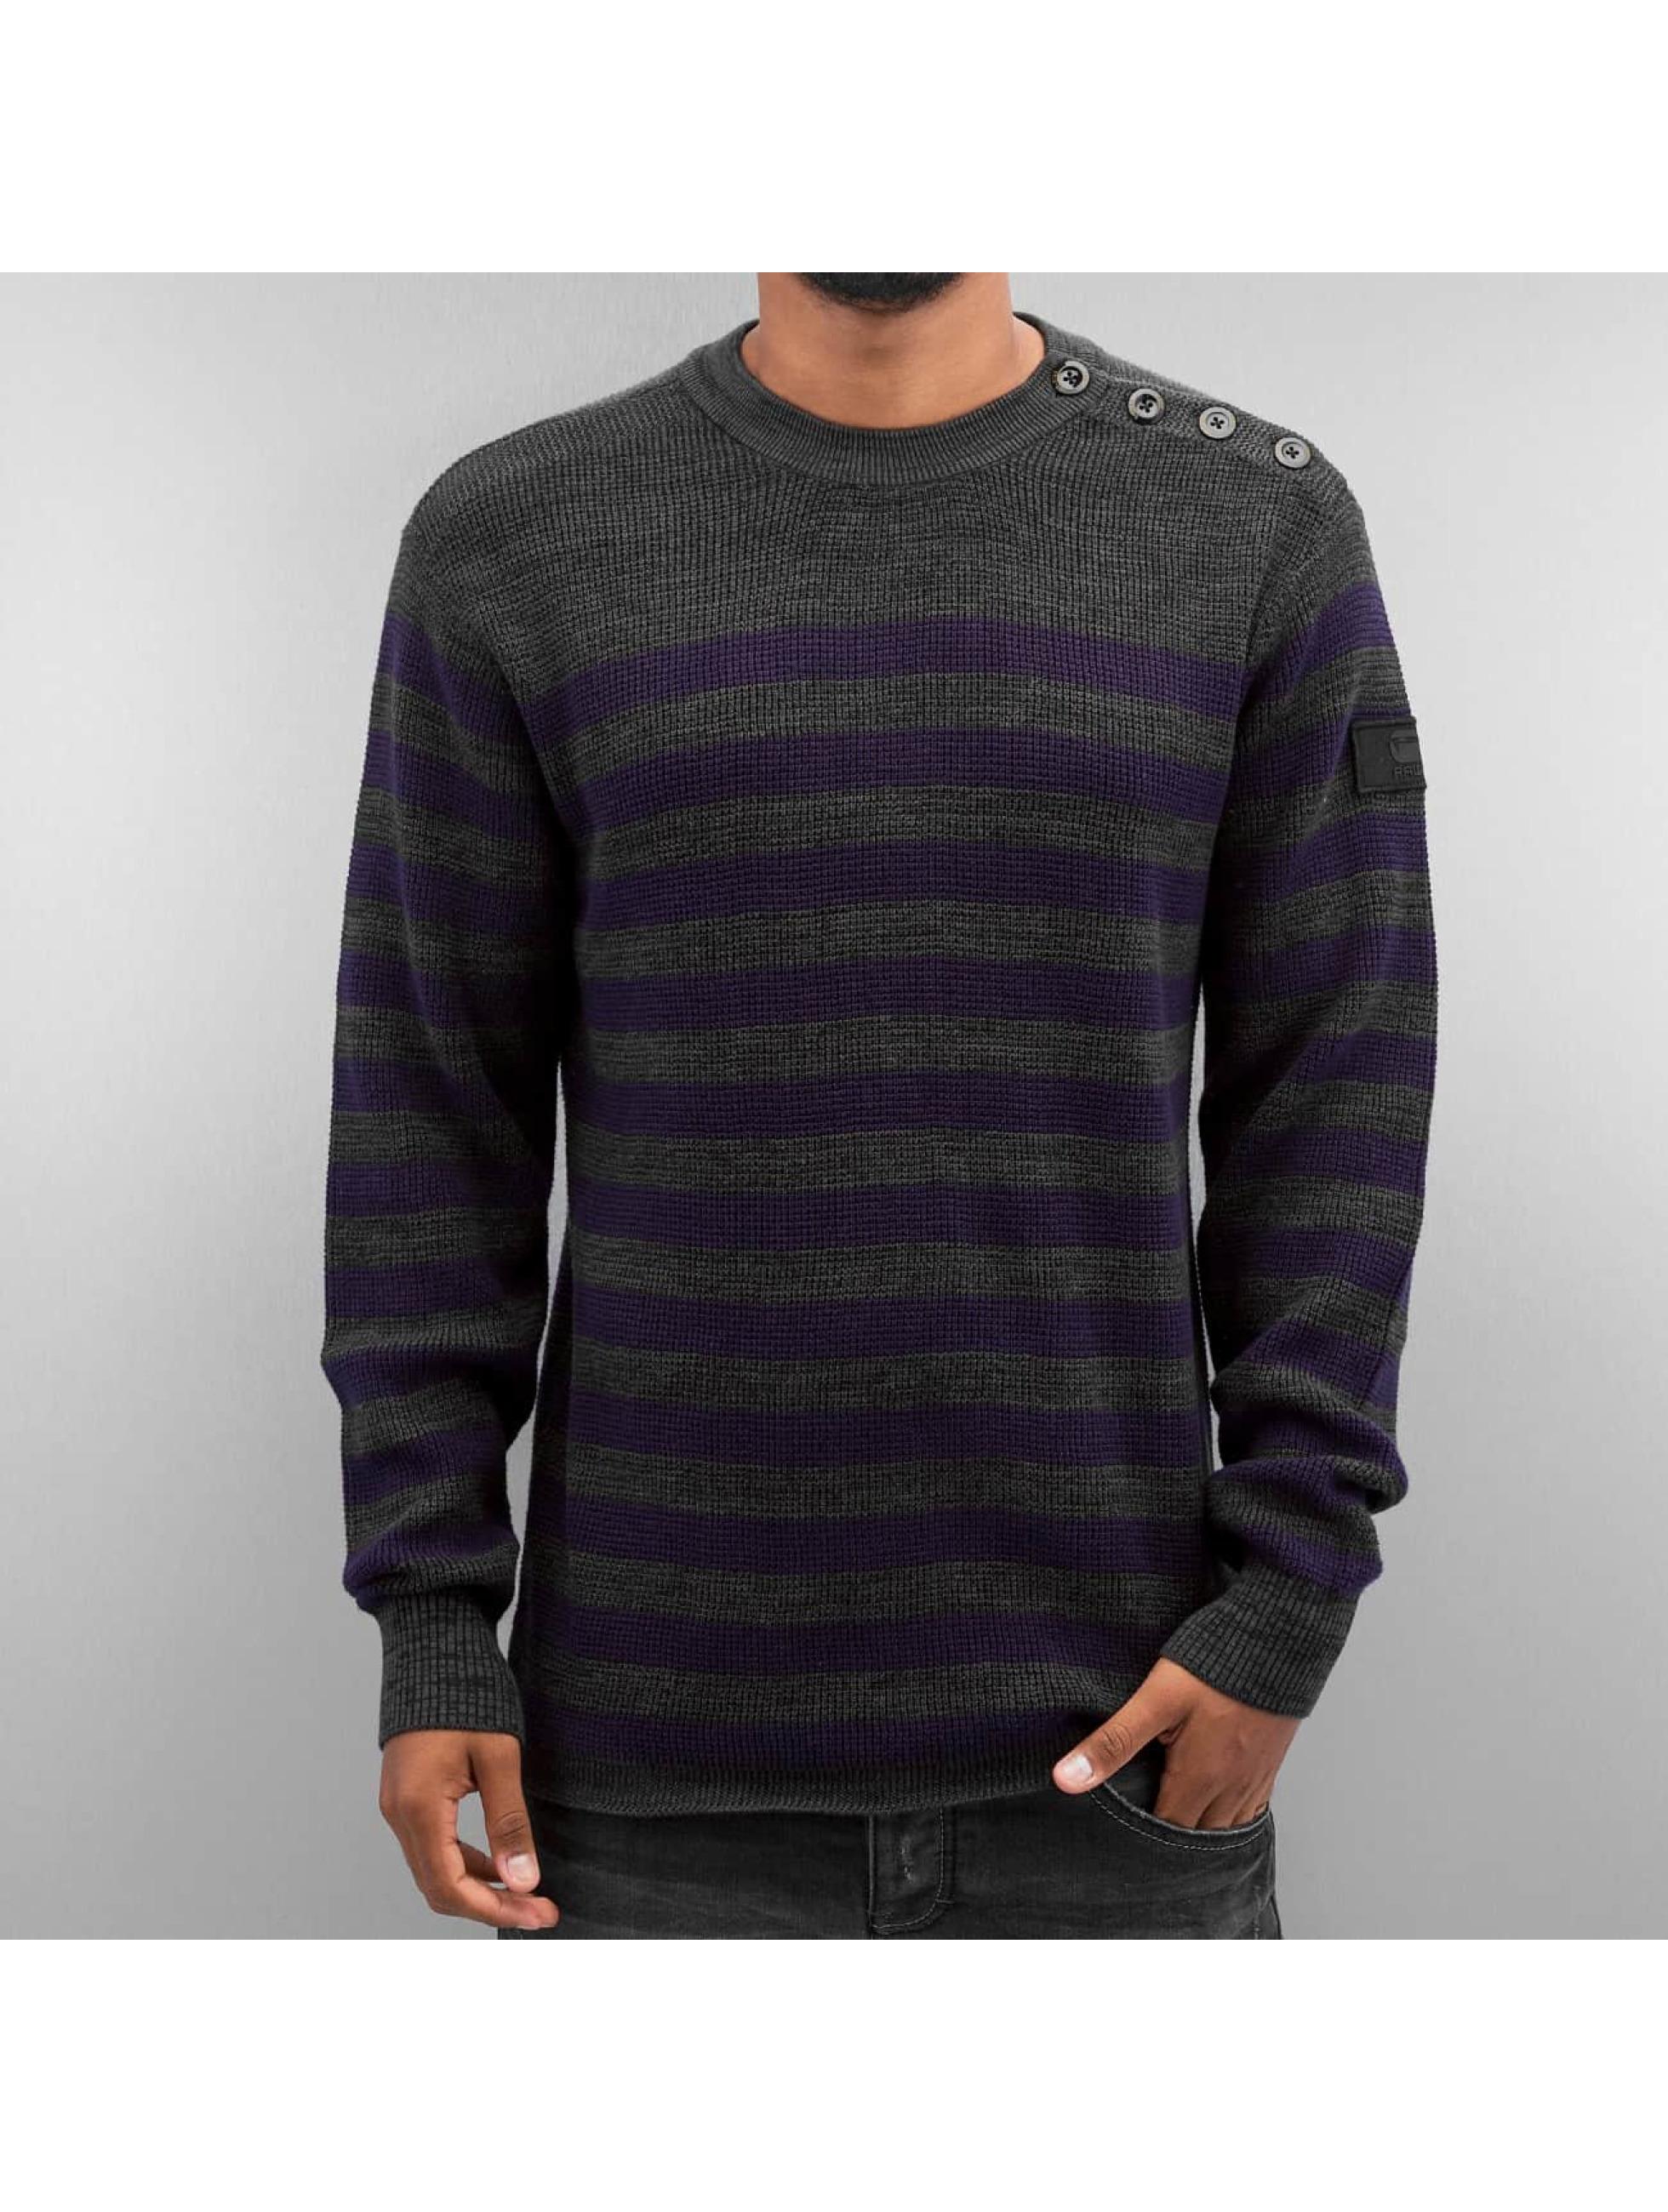 G-Star Jumper Dadin Stripe Knit grey